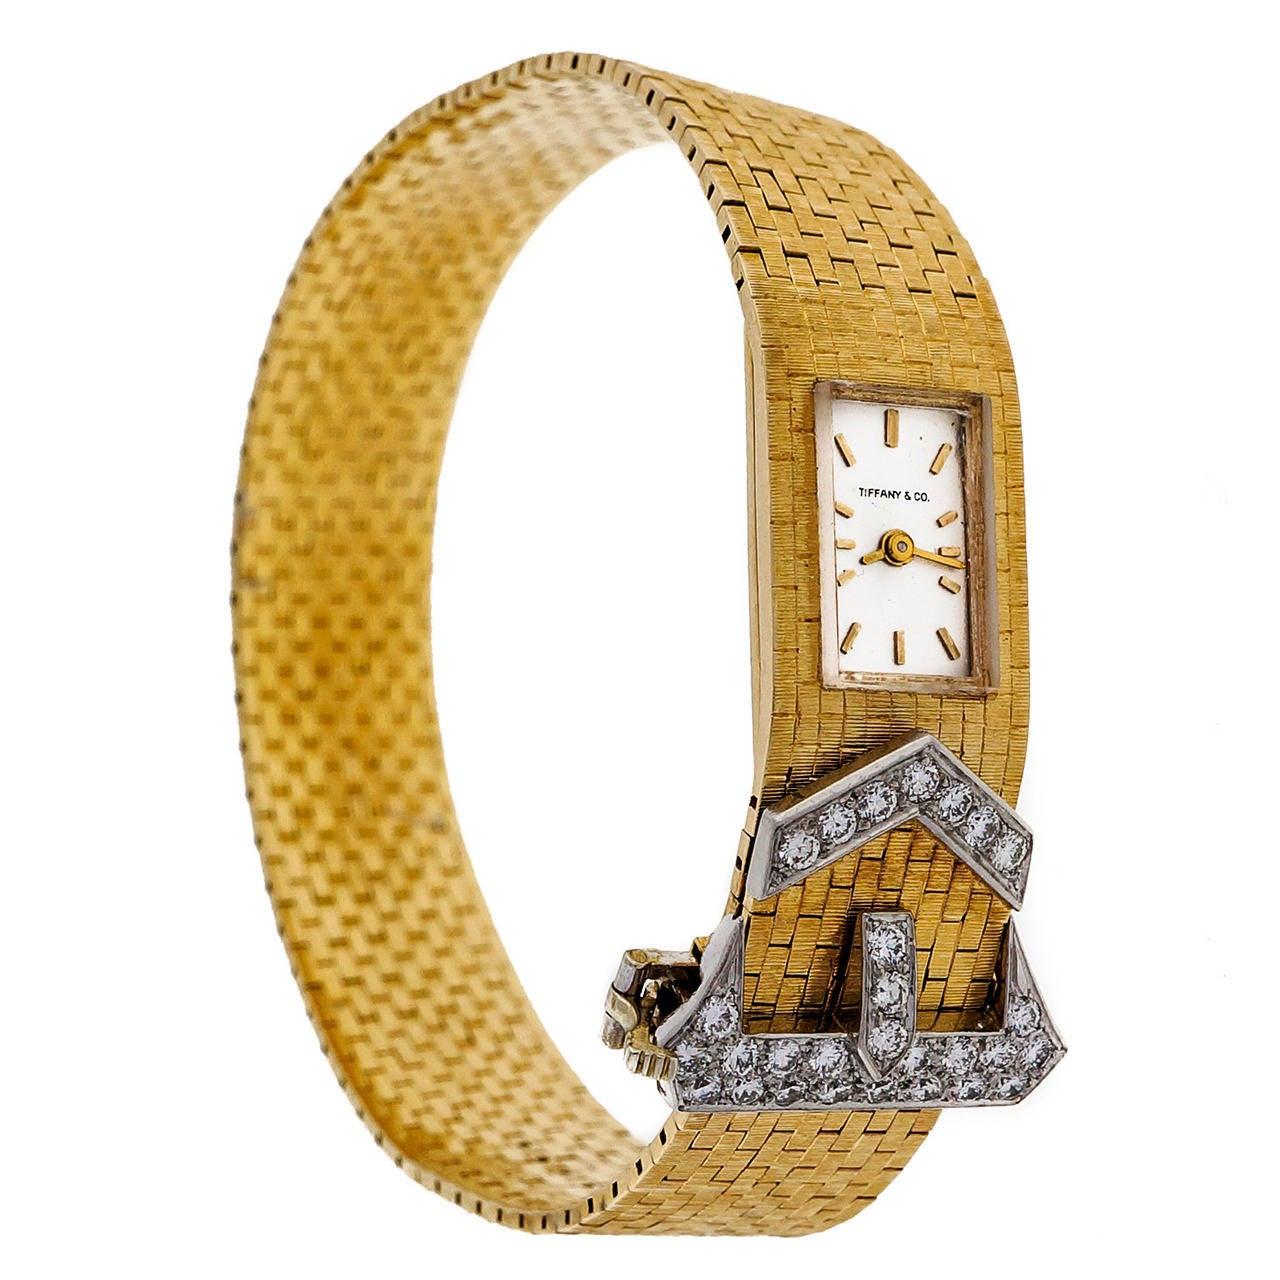 Tiffany & Co Lady's Yellow Gold and Diamond Buckle Bracelet Watch circa 1950s